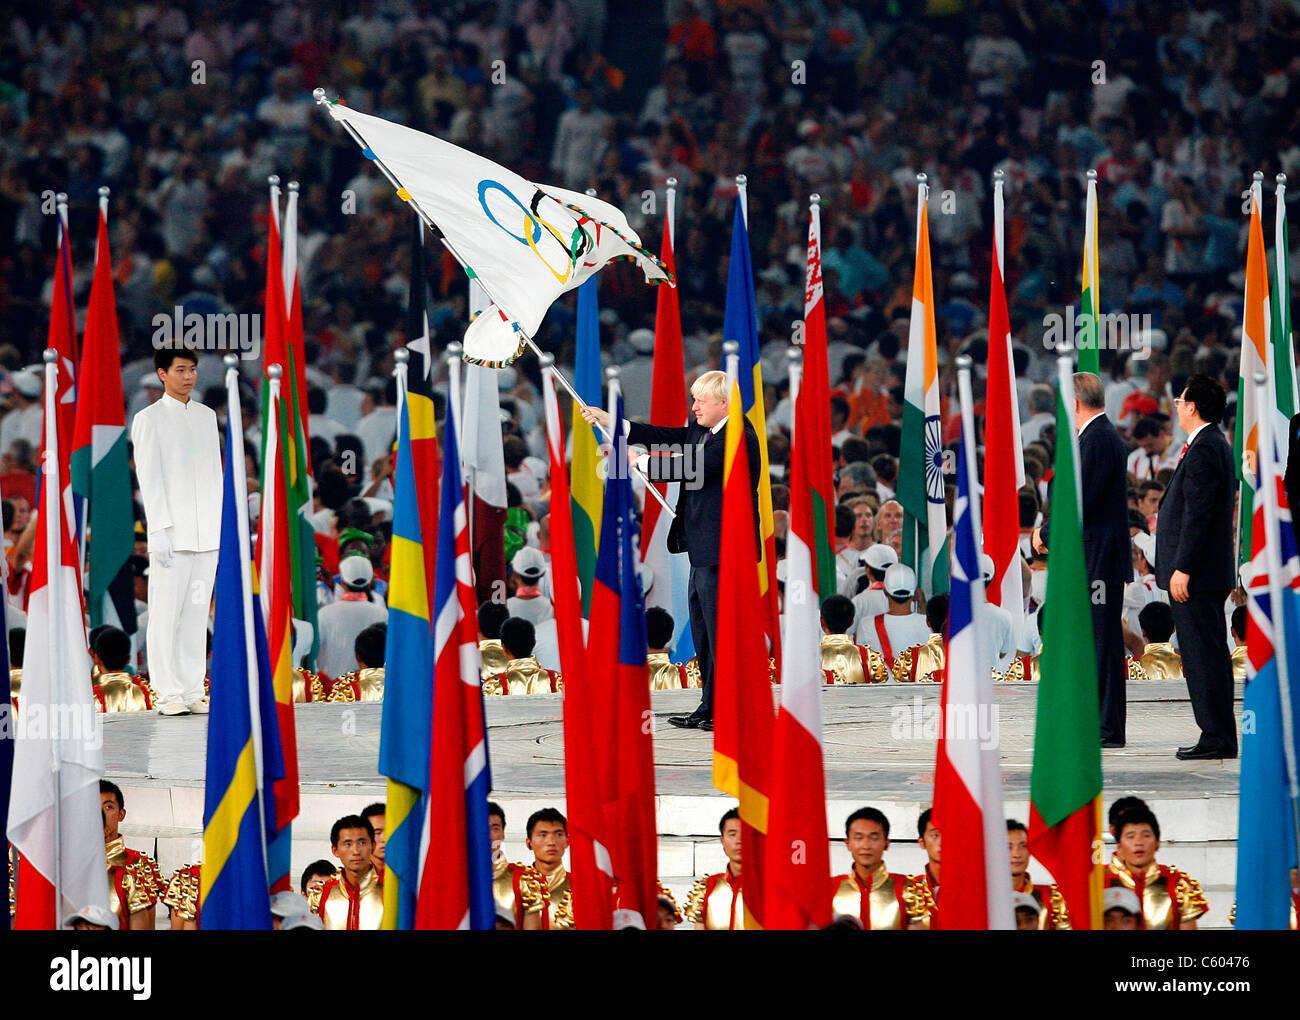 BORIS JOHNSON AND OLYMPIC FLAG BIRDS NEST OLYMPIC STADIUM OLYMPIC STADIUM BEIJING CHINA 24 August 2008 - Stock Image